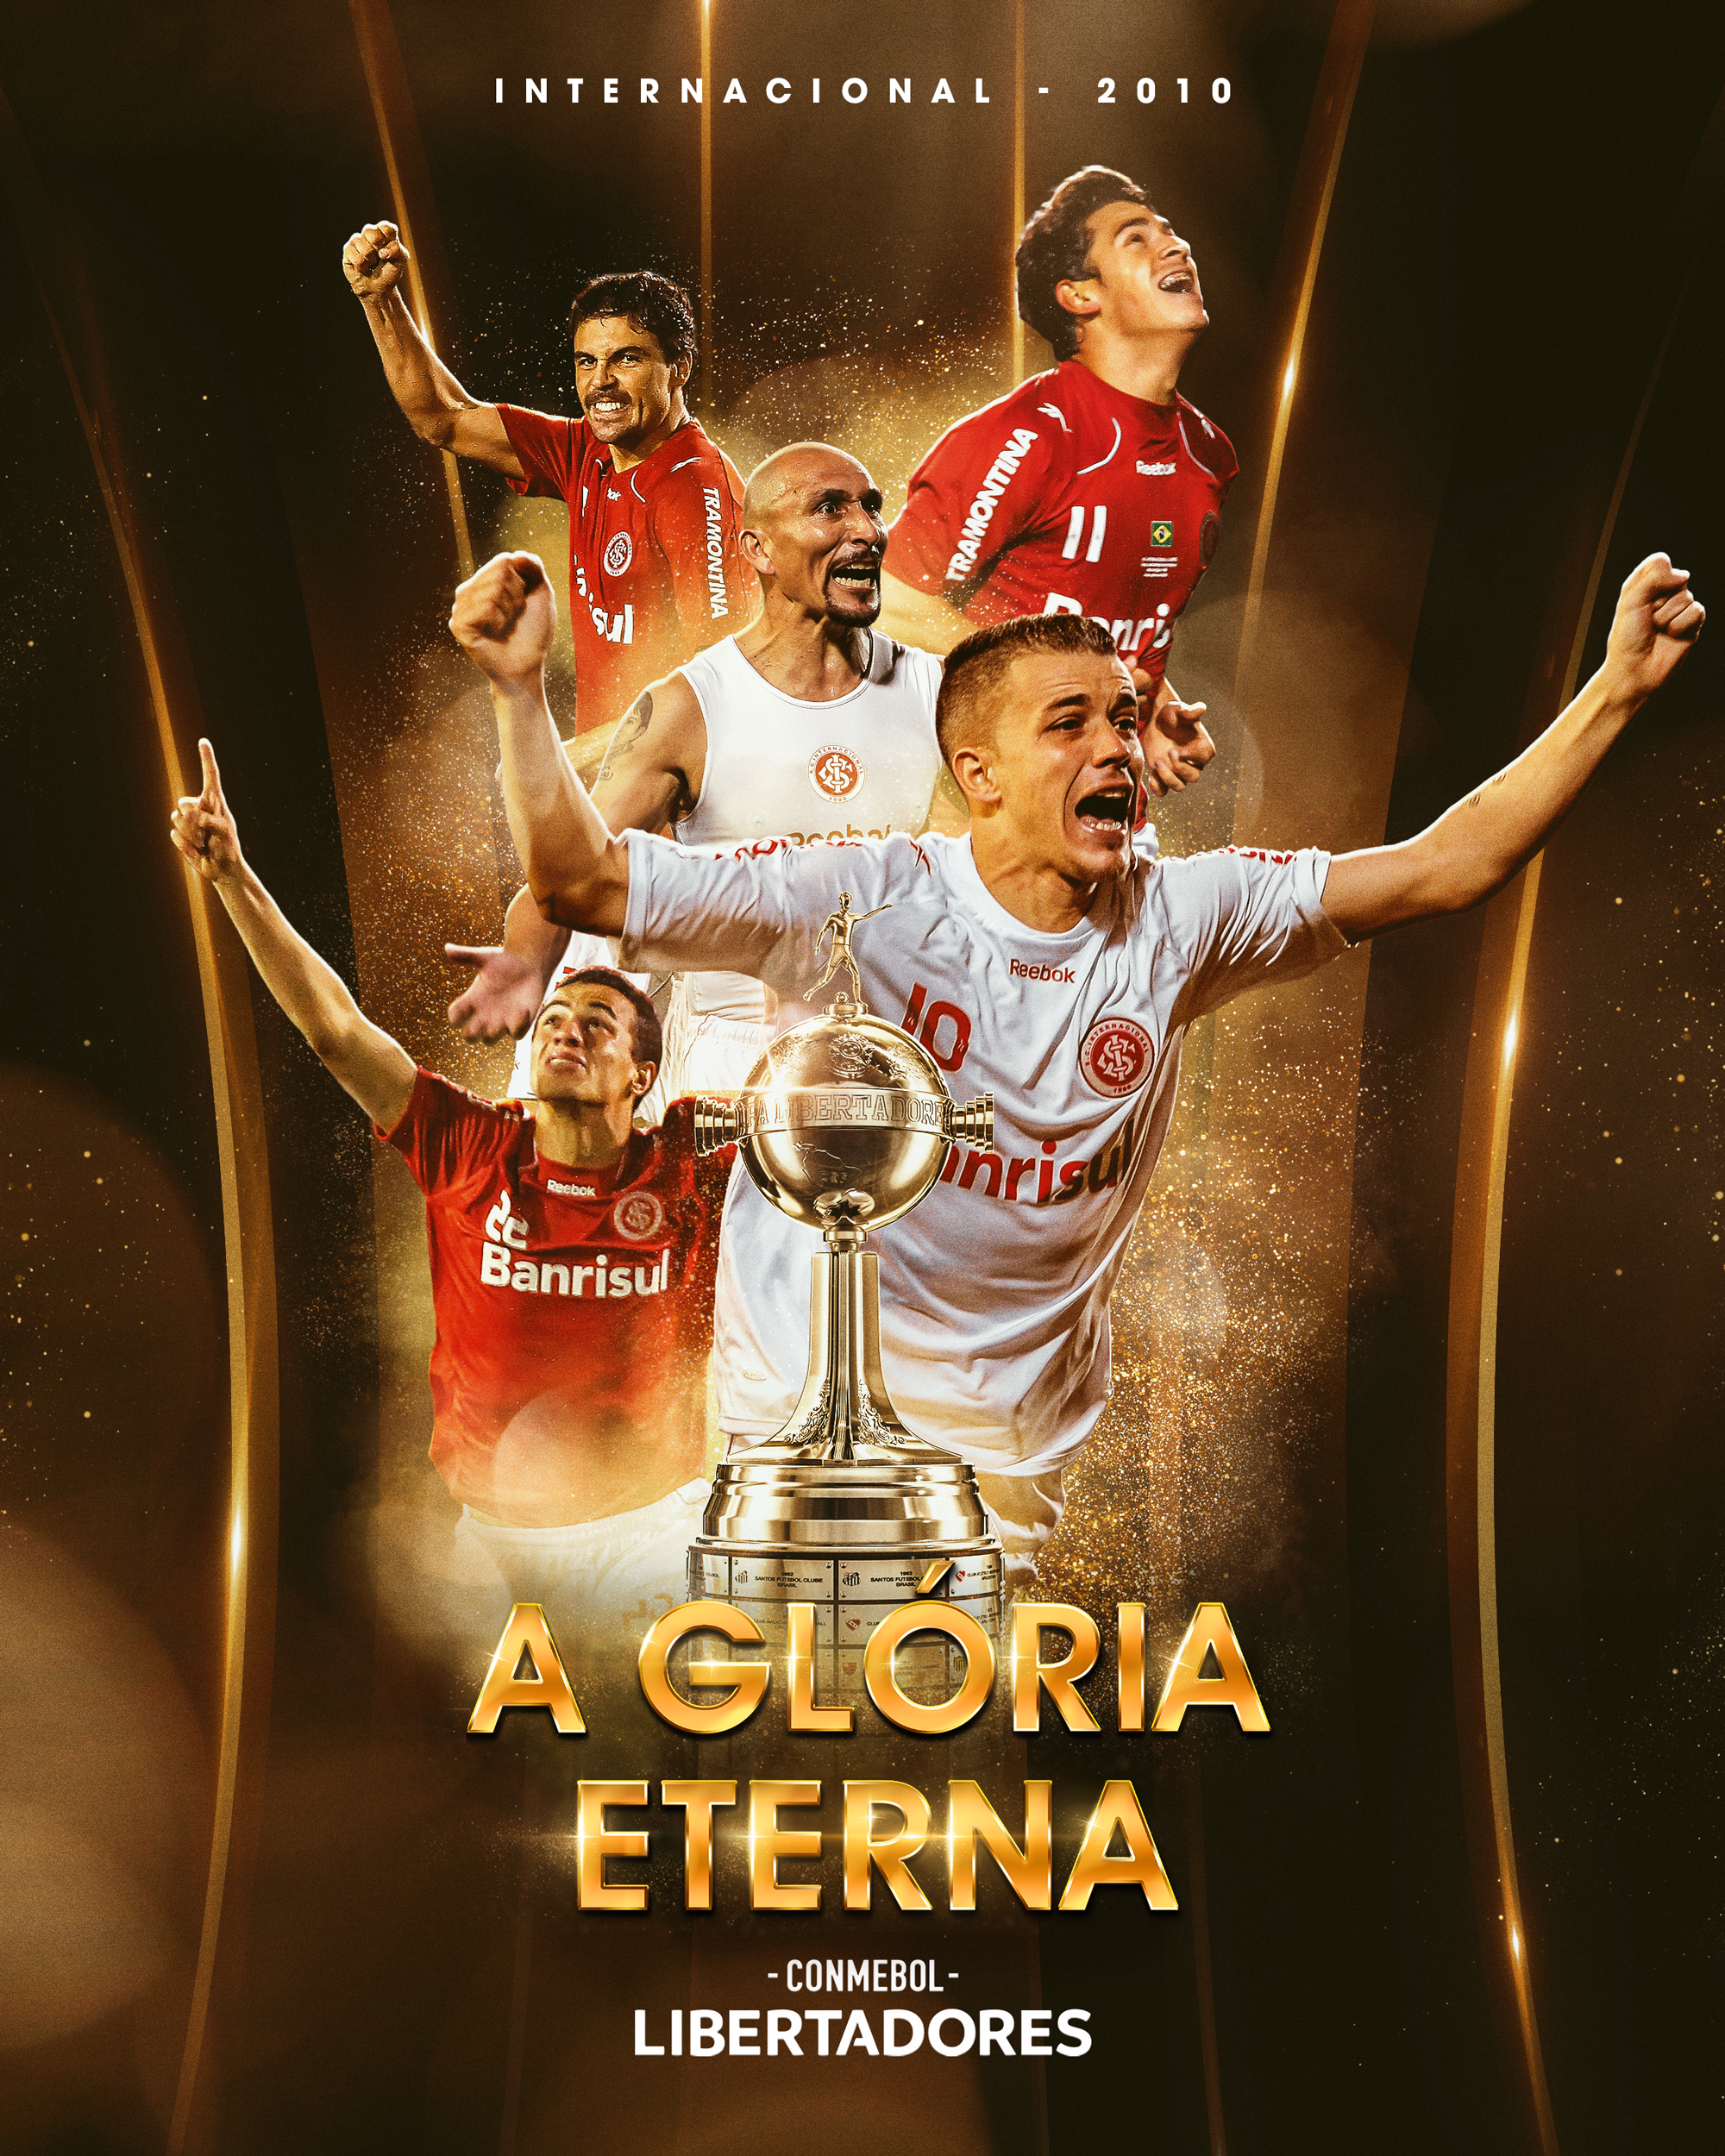 Internacional Libertadores 2010